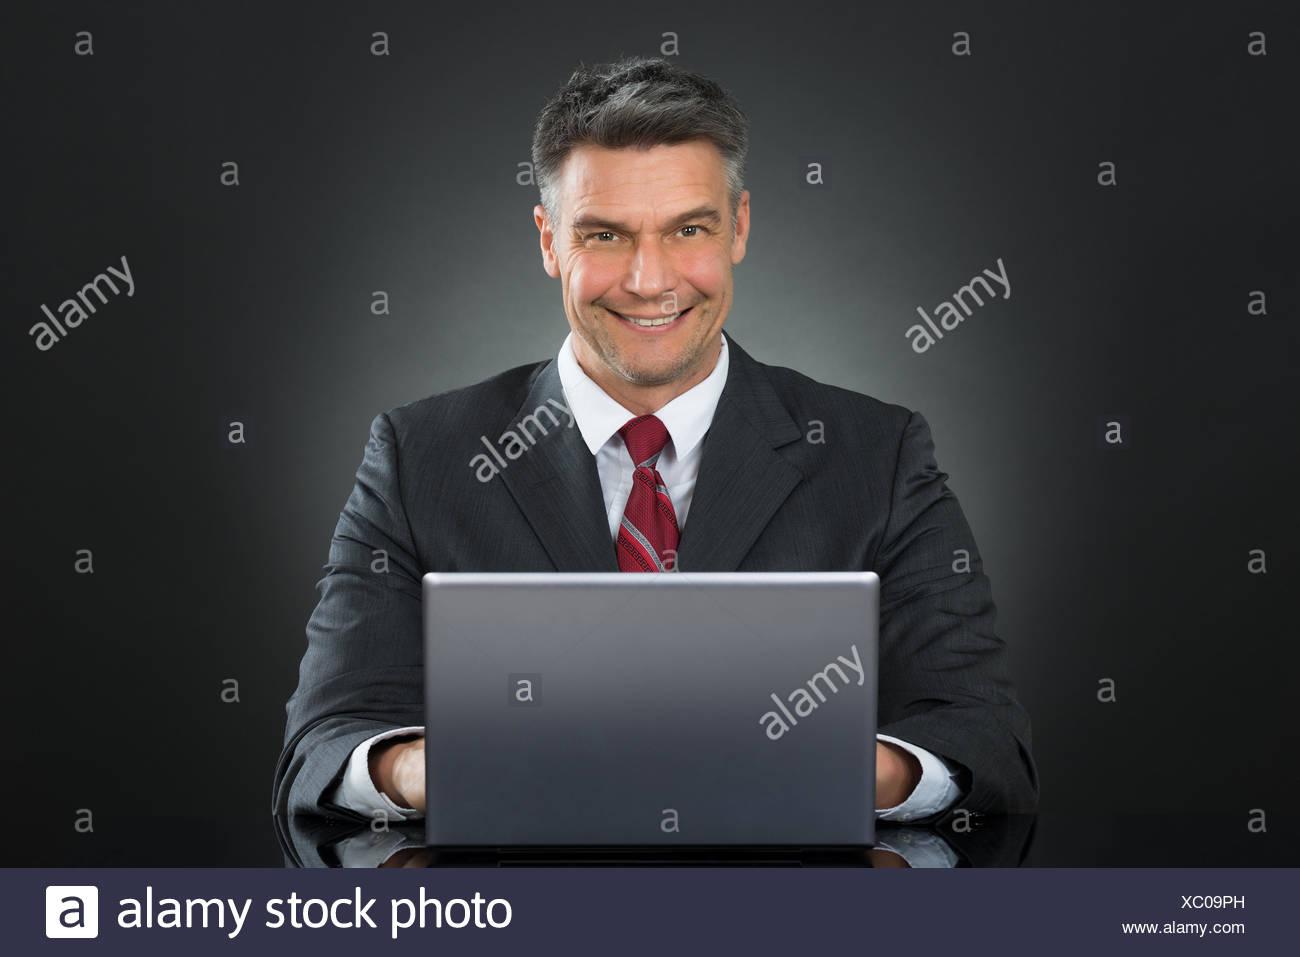 Businessman Working On Laptop At Desk - Stock Image